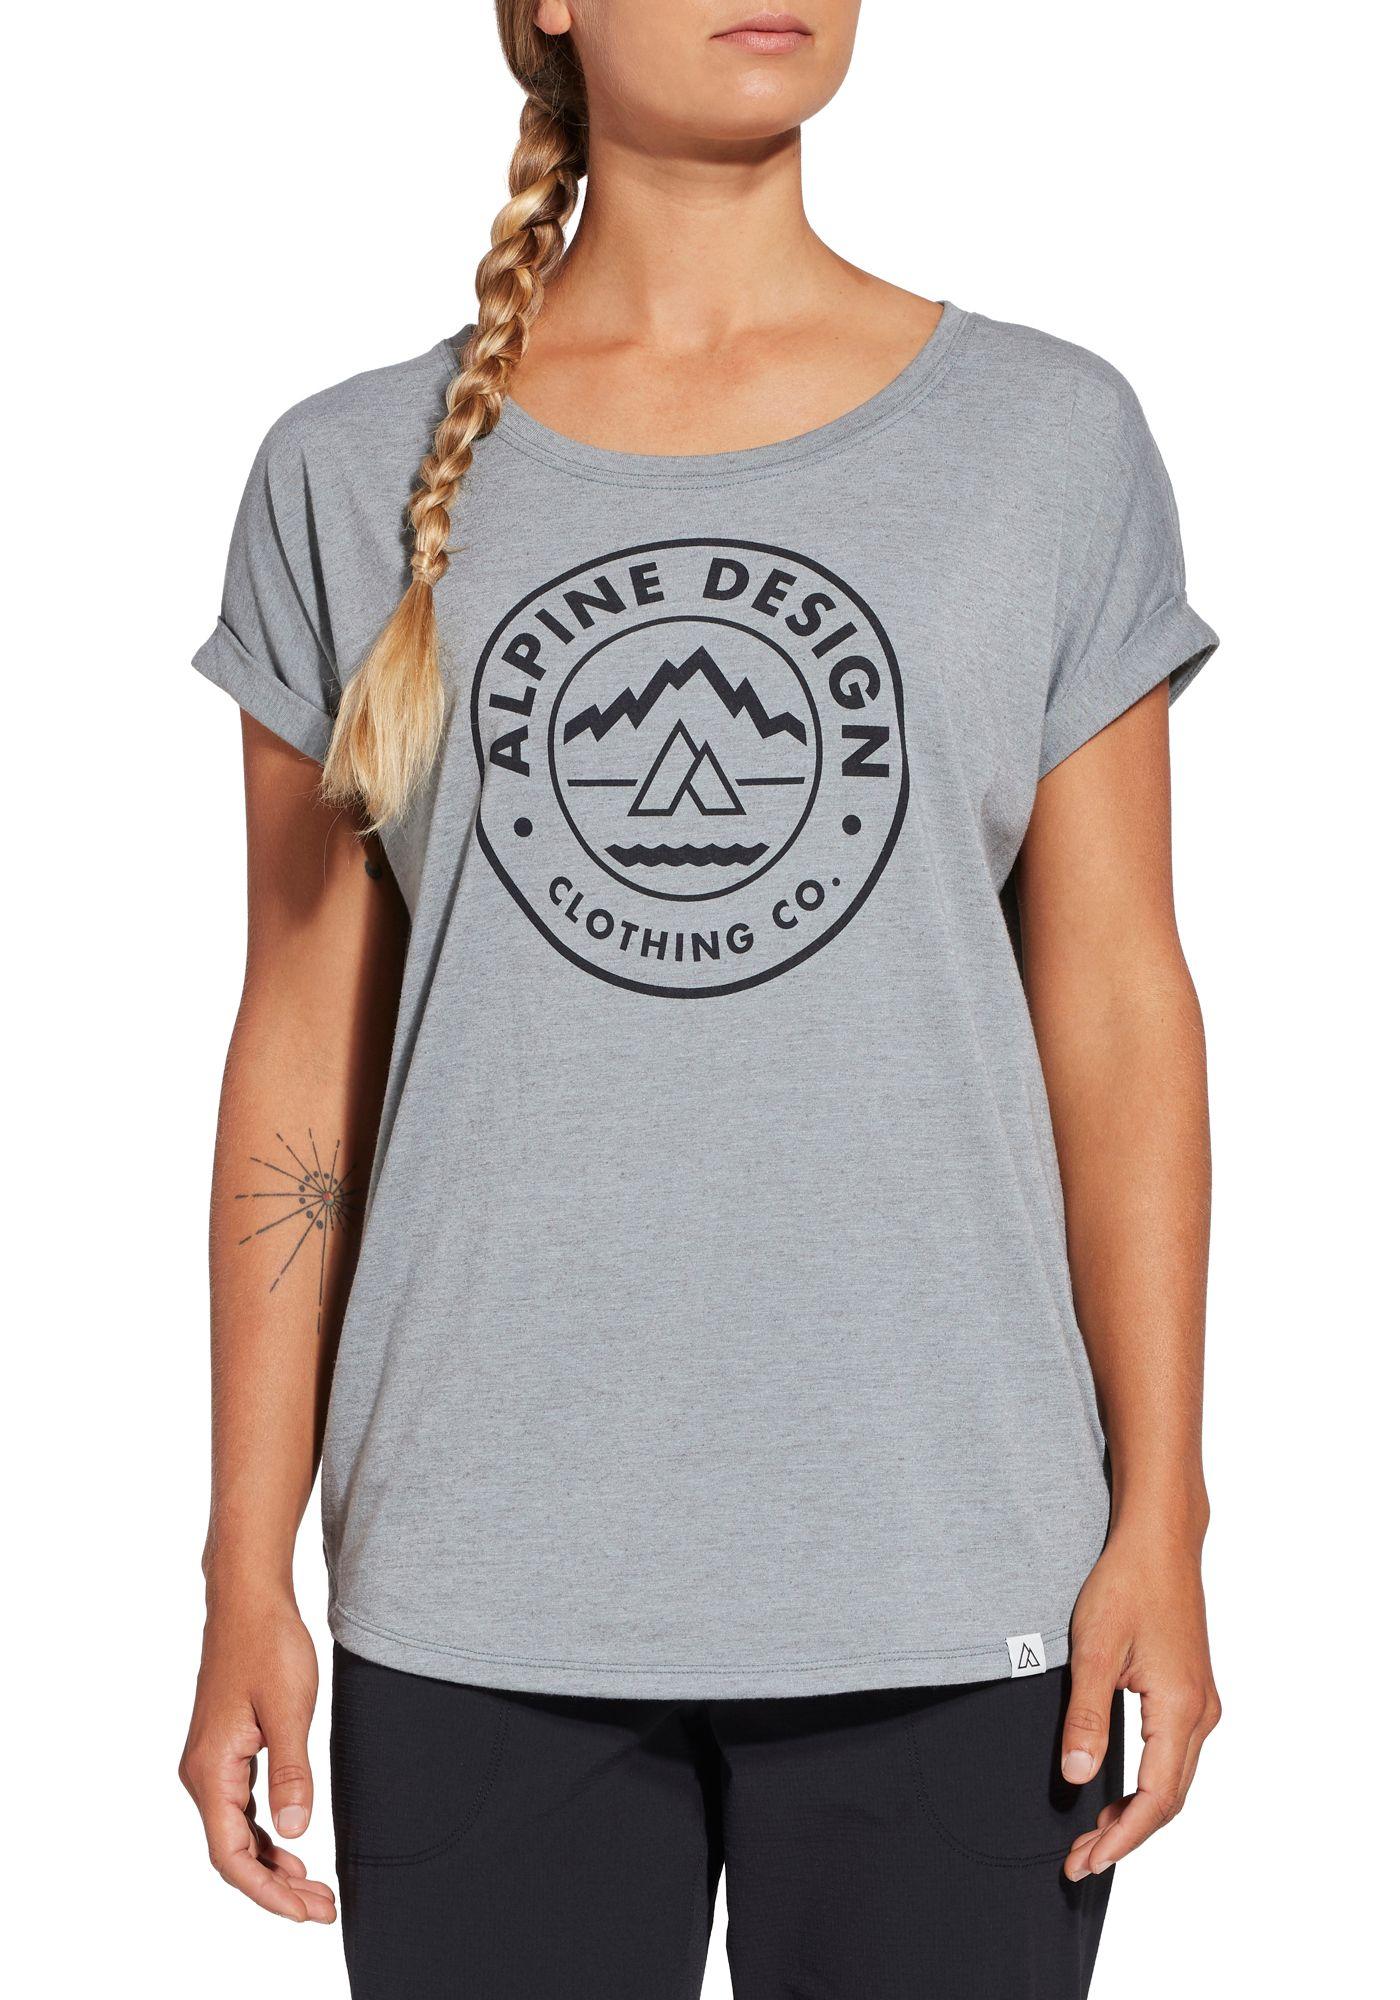 Alpine Design Women's Graphic T-Shirt